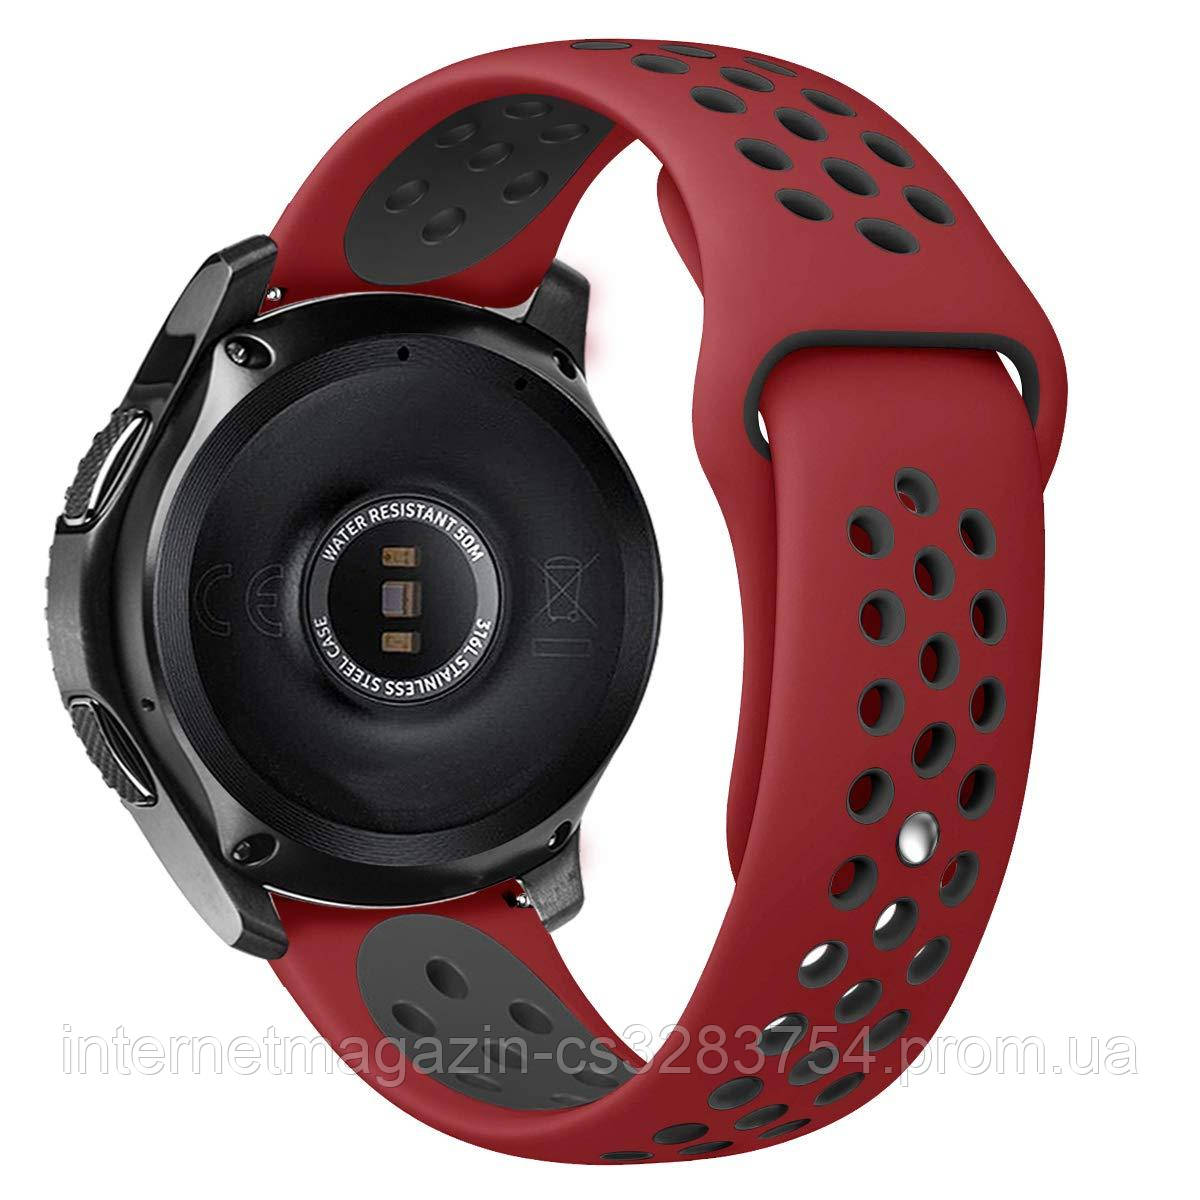 Ремешок BeWatch sport-style для Samsung Gear 3  Red-Black (1020131)